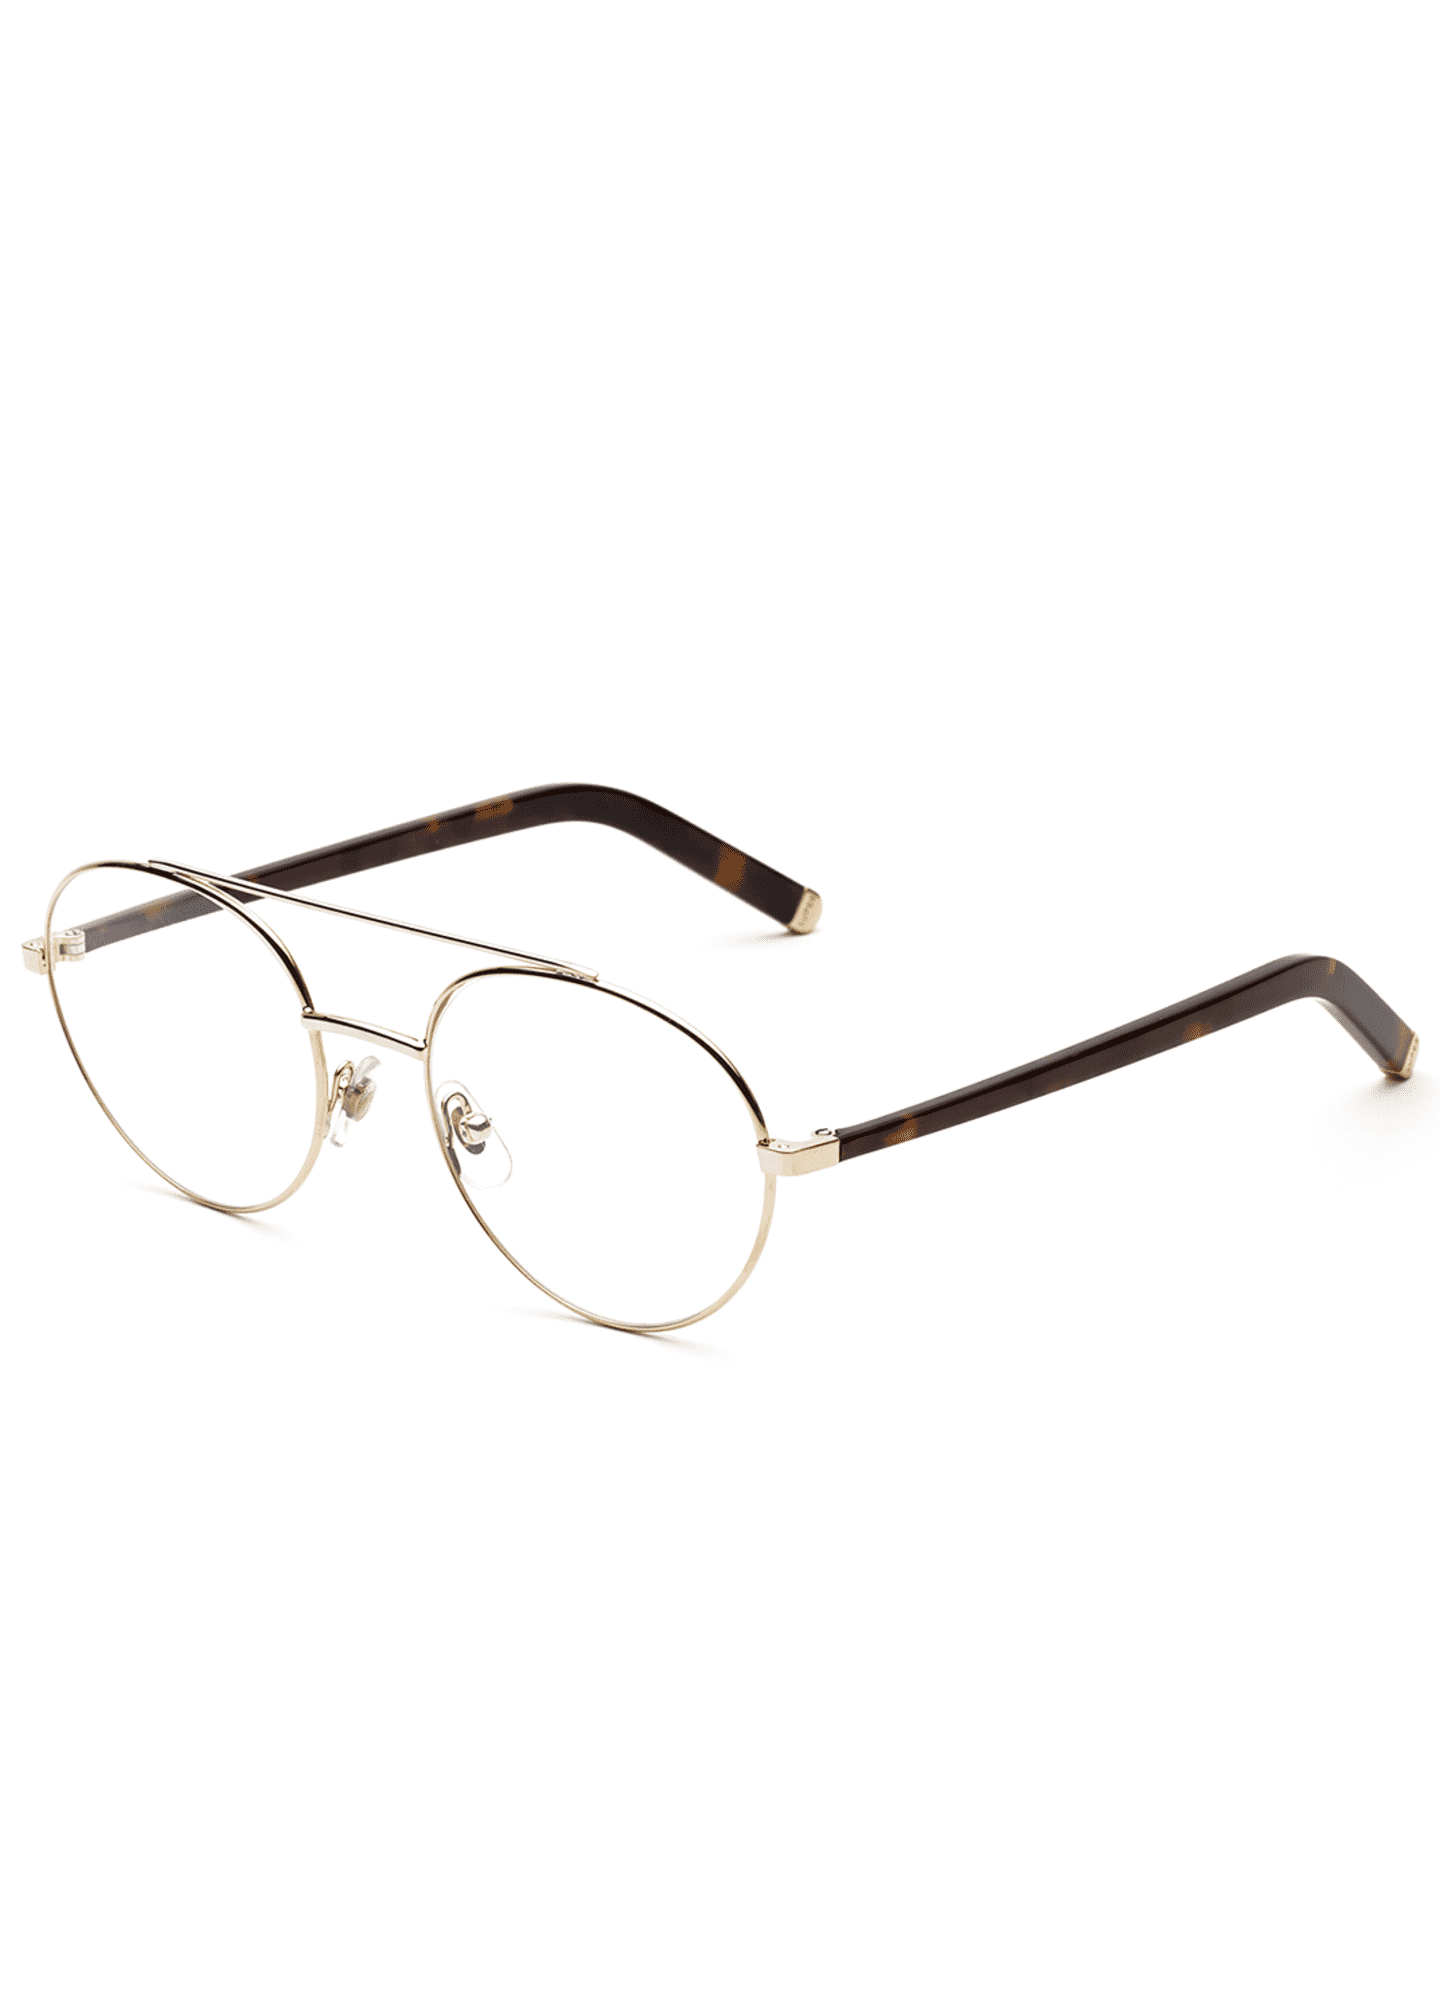 Super by Retrosuperfuture Numero 32 Optical Frames